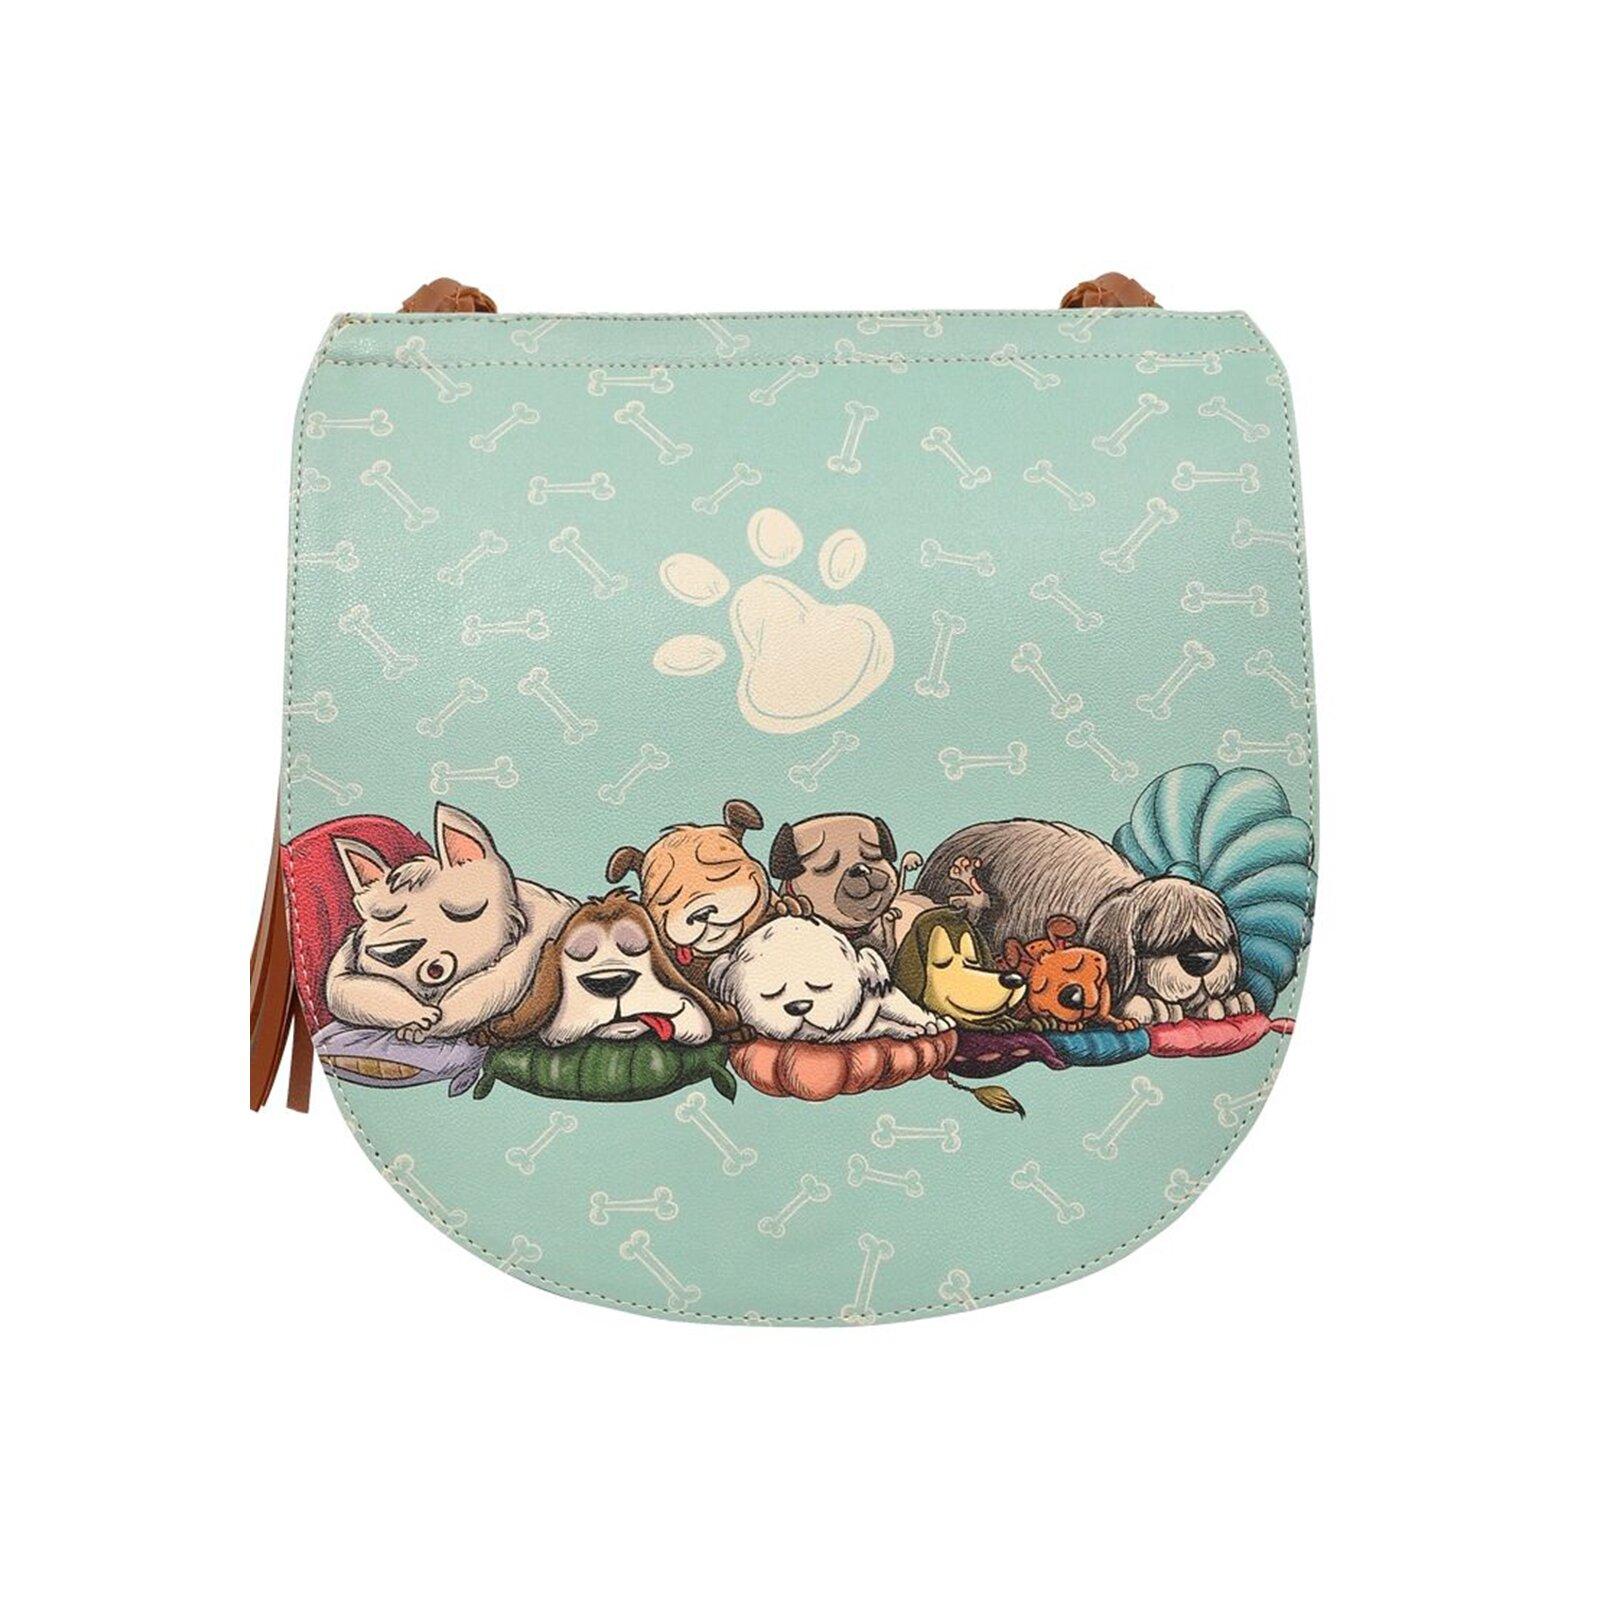 DOGO Ivy Bag - Sleeping Dogs